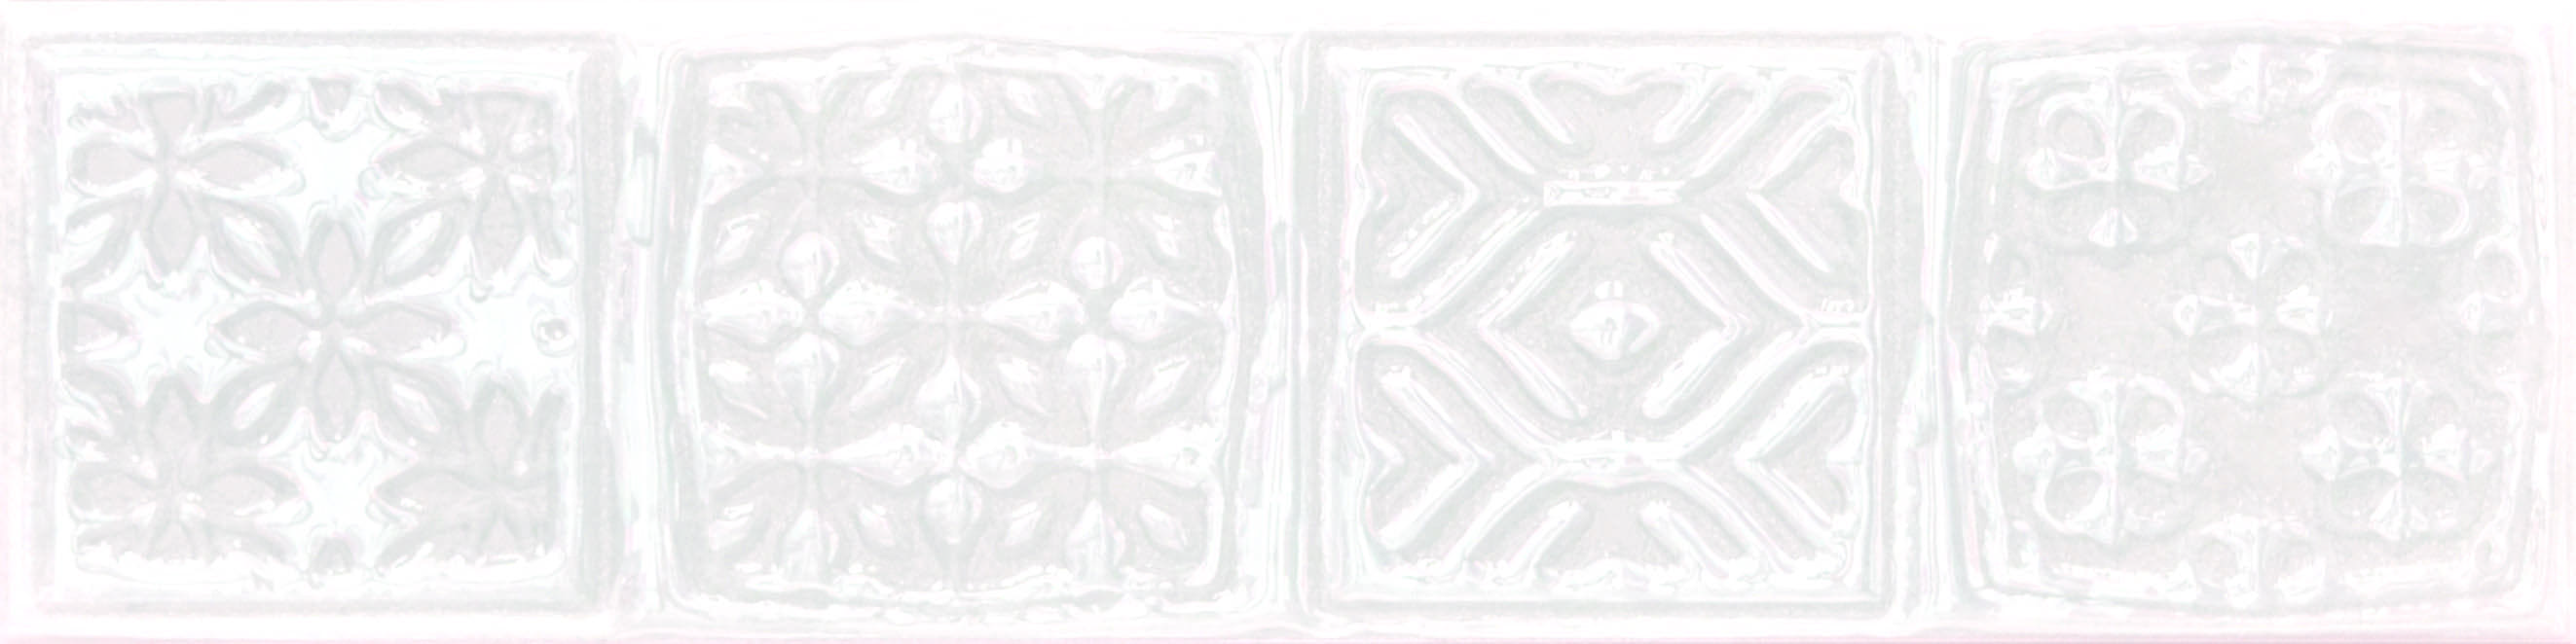 Rodia Snow / 3x12 Olympus - Hypnos 0